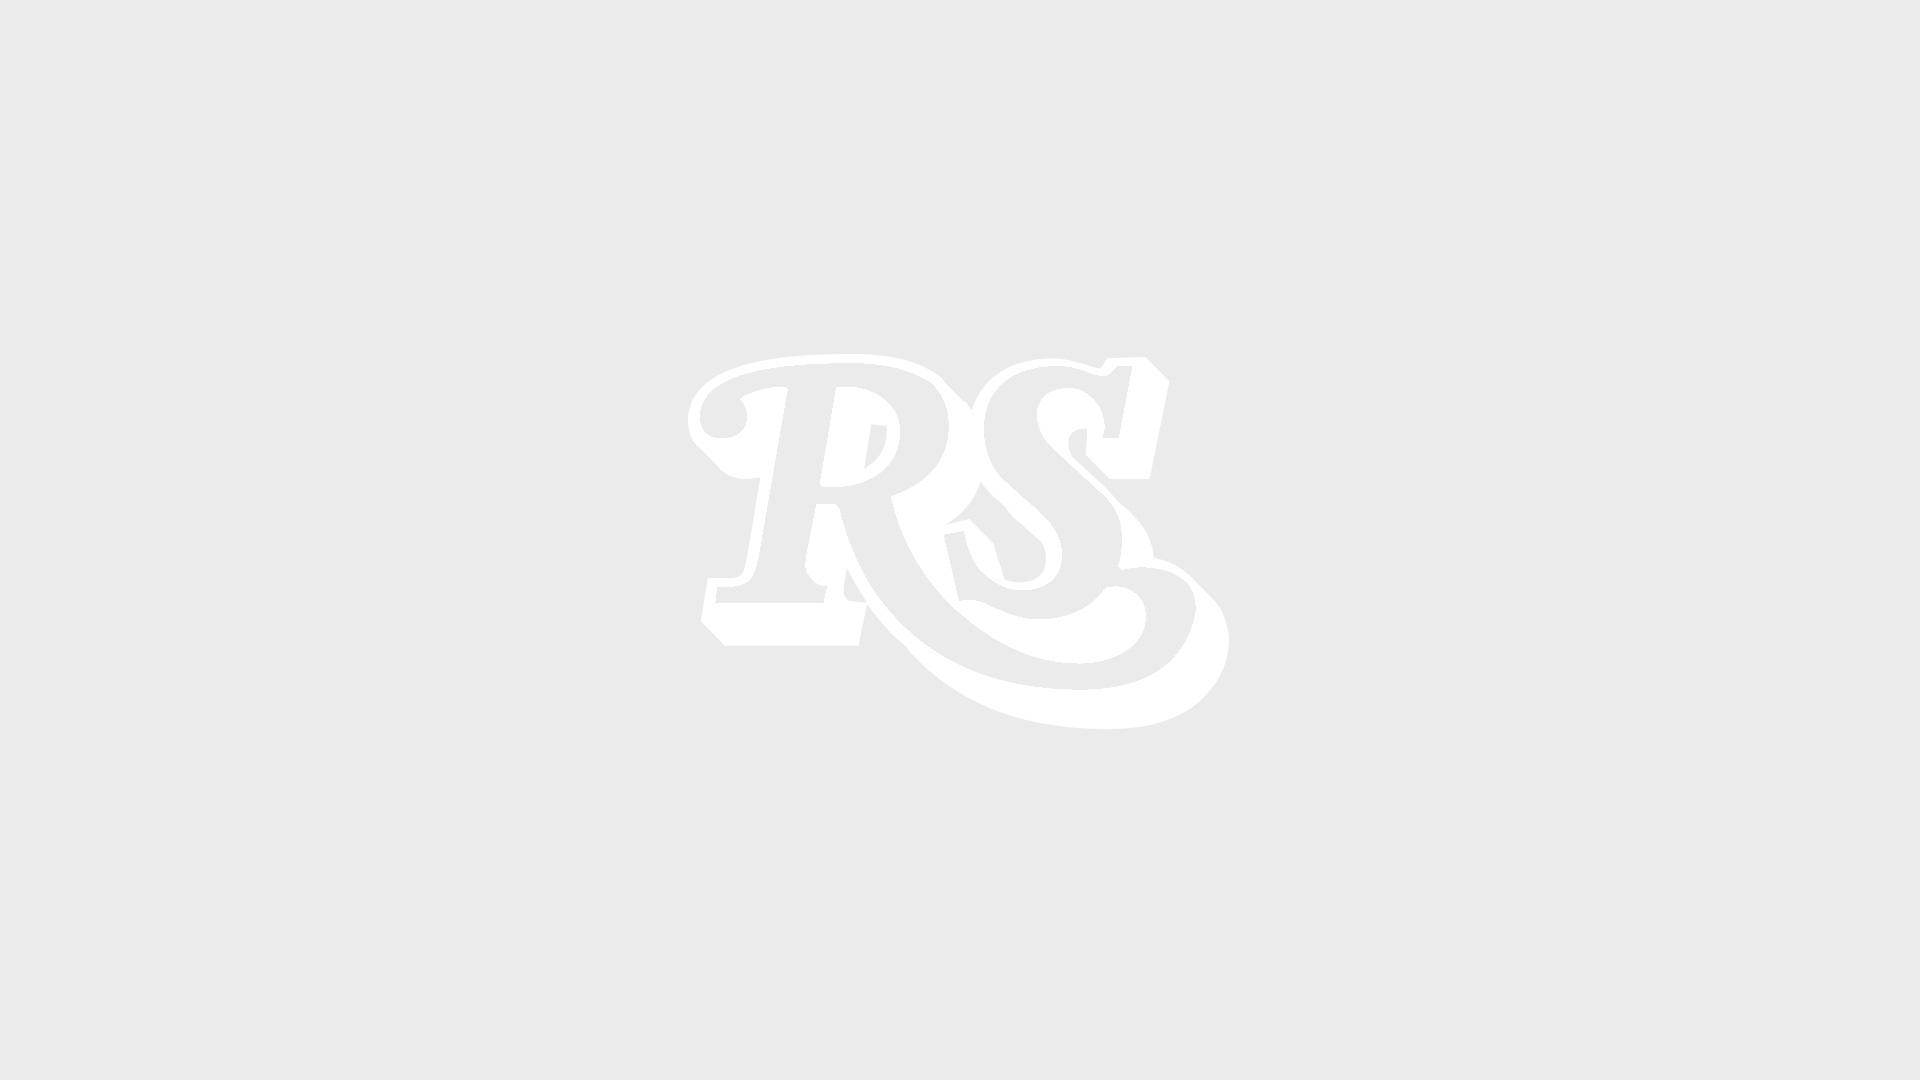 HOLLYWOOD, CA - DECEMBER 14:  (L-R) Actor Rob Lowe, Sheryl Berkoff, John Owen Lowe and Matthew Edward Lowe attend the Premier